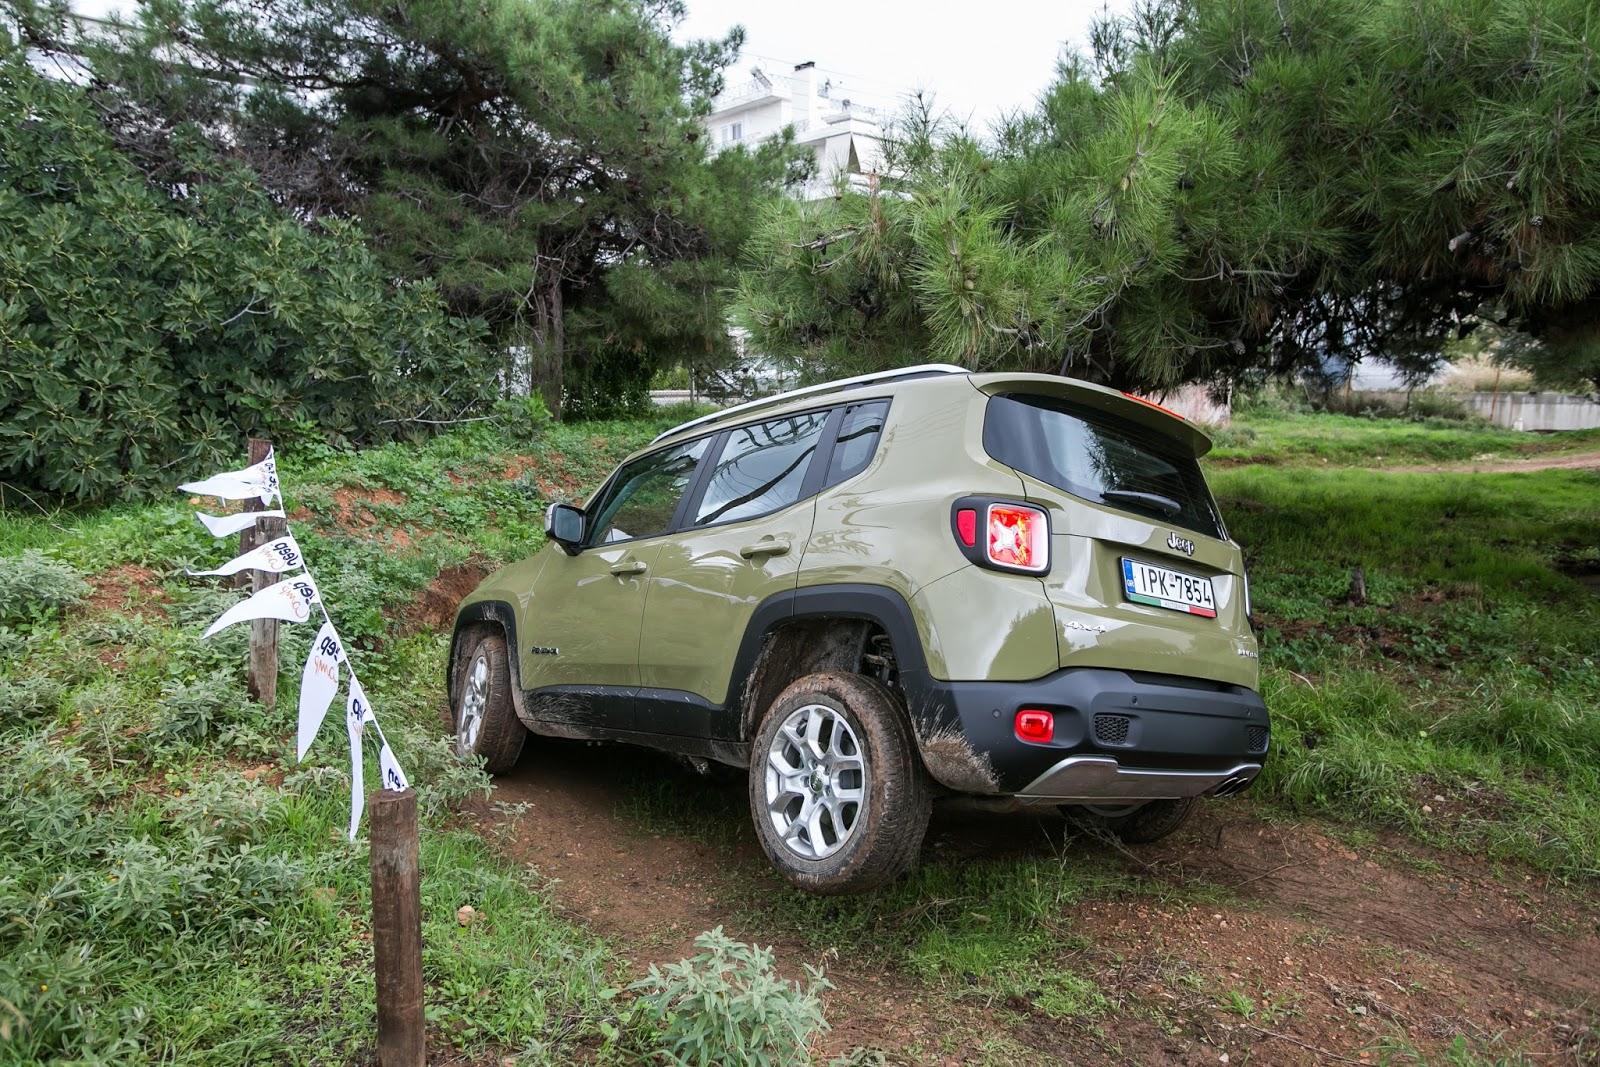 GK 0369 Πετάμε ένα Jeep Renegade σε λάσπες, πέτρες, άμμο, λίμνες. Θα τα καταφέρει; Jeep, Jeep Renegade, Renegade, SUV, TEST, zblog, ΔΟΚΙΜΕΣ